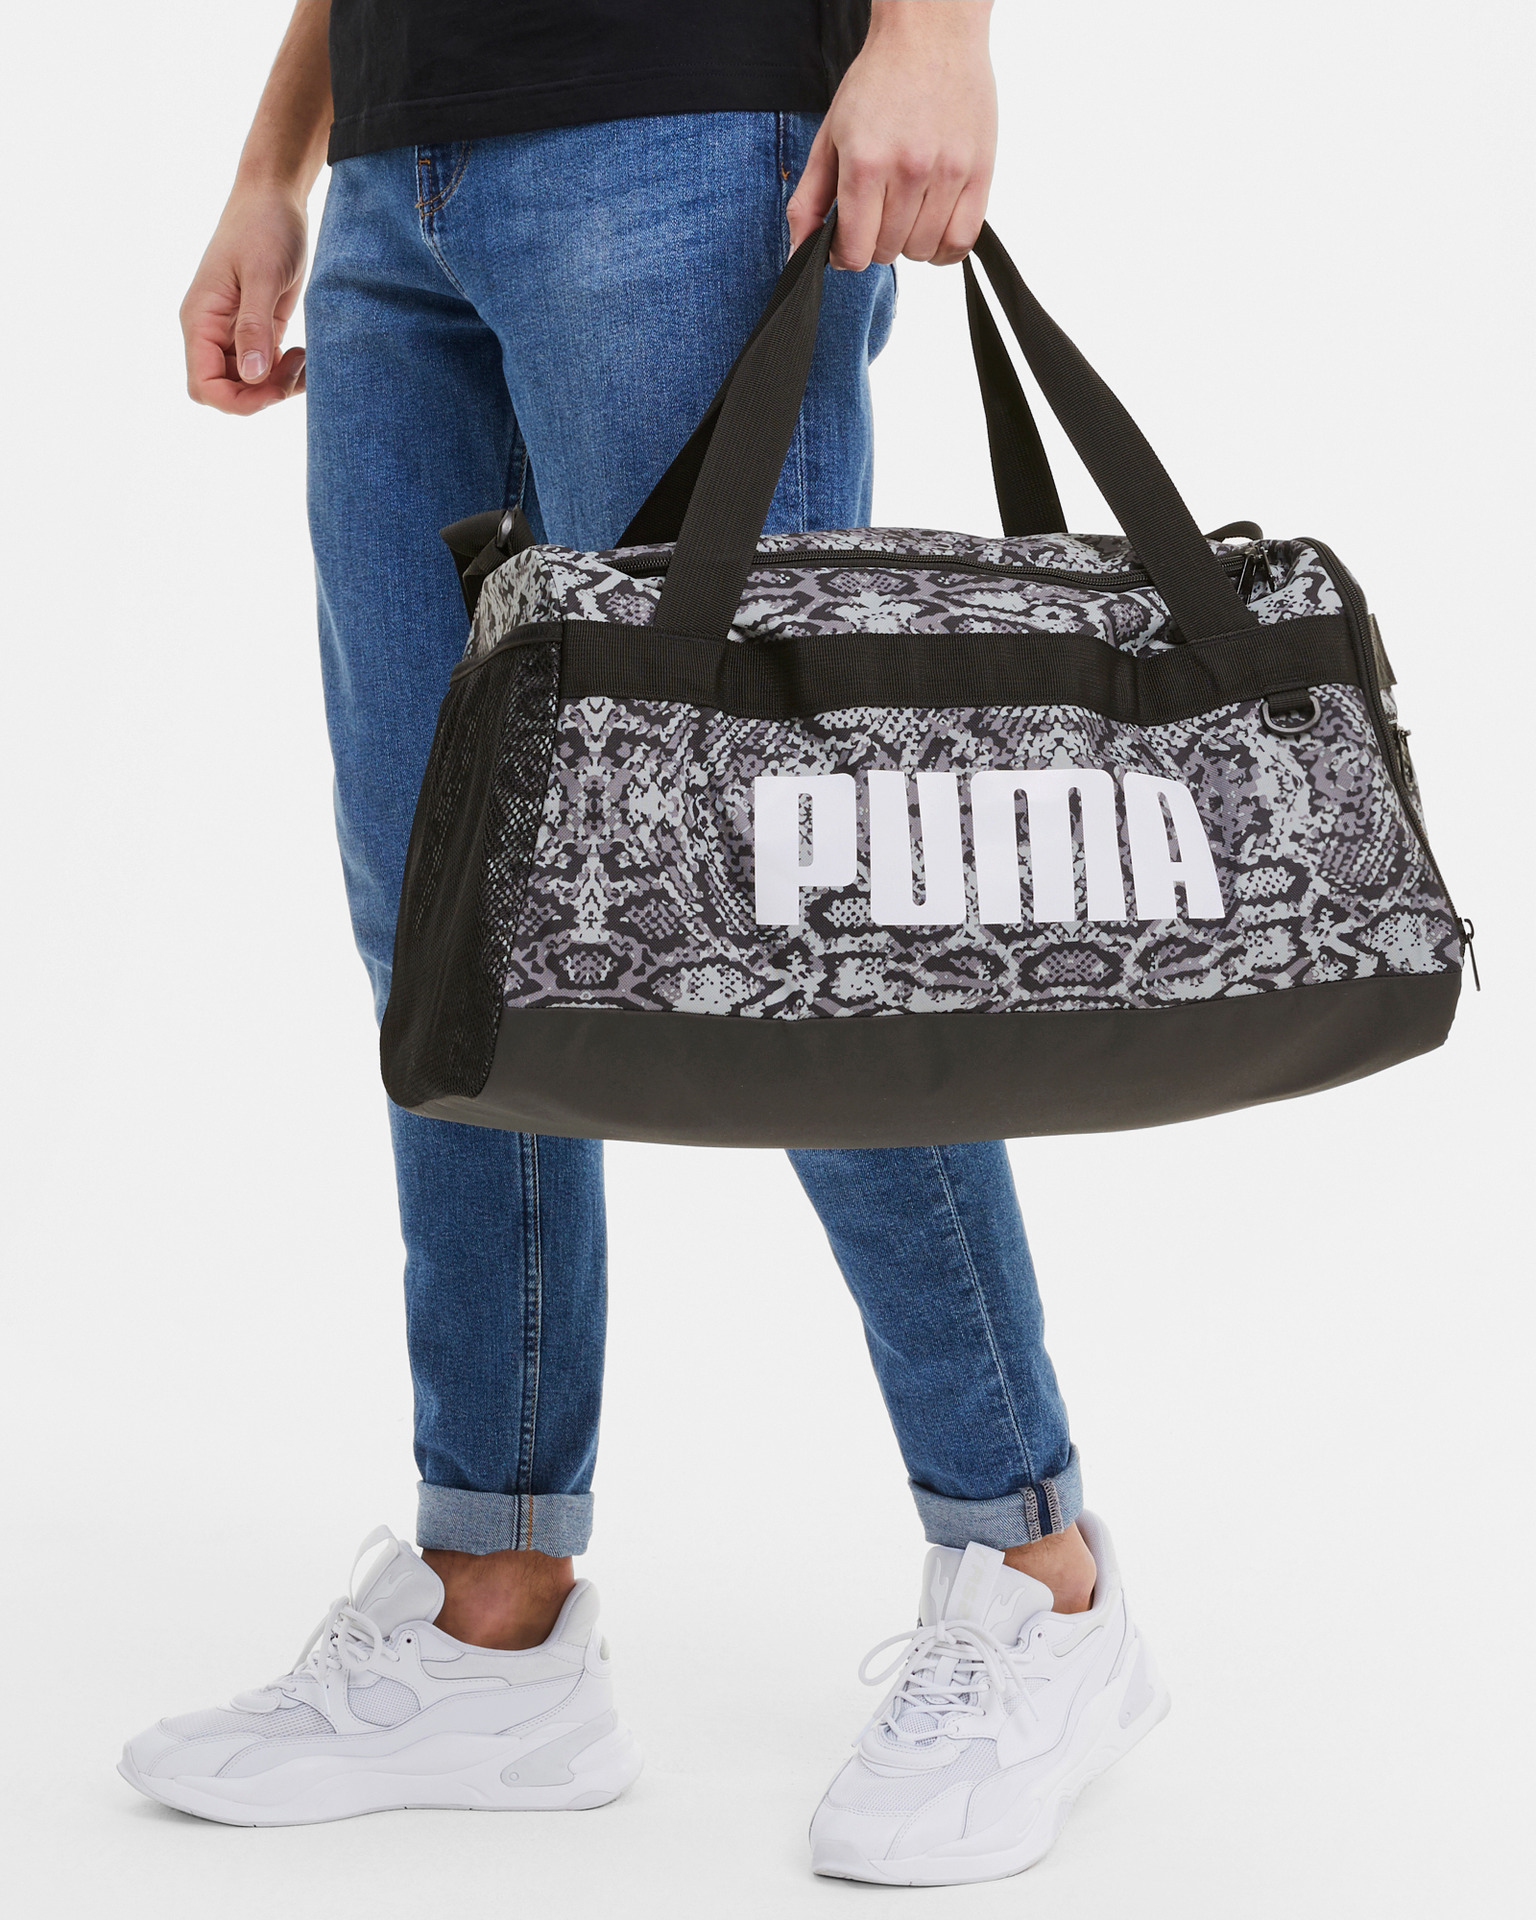 Puma - Challenger Duffel Bag Bibloo.com